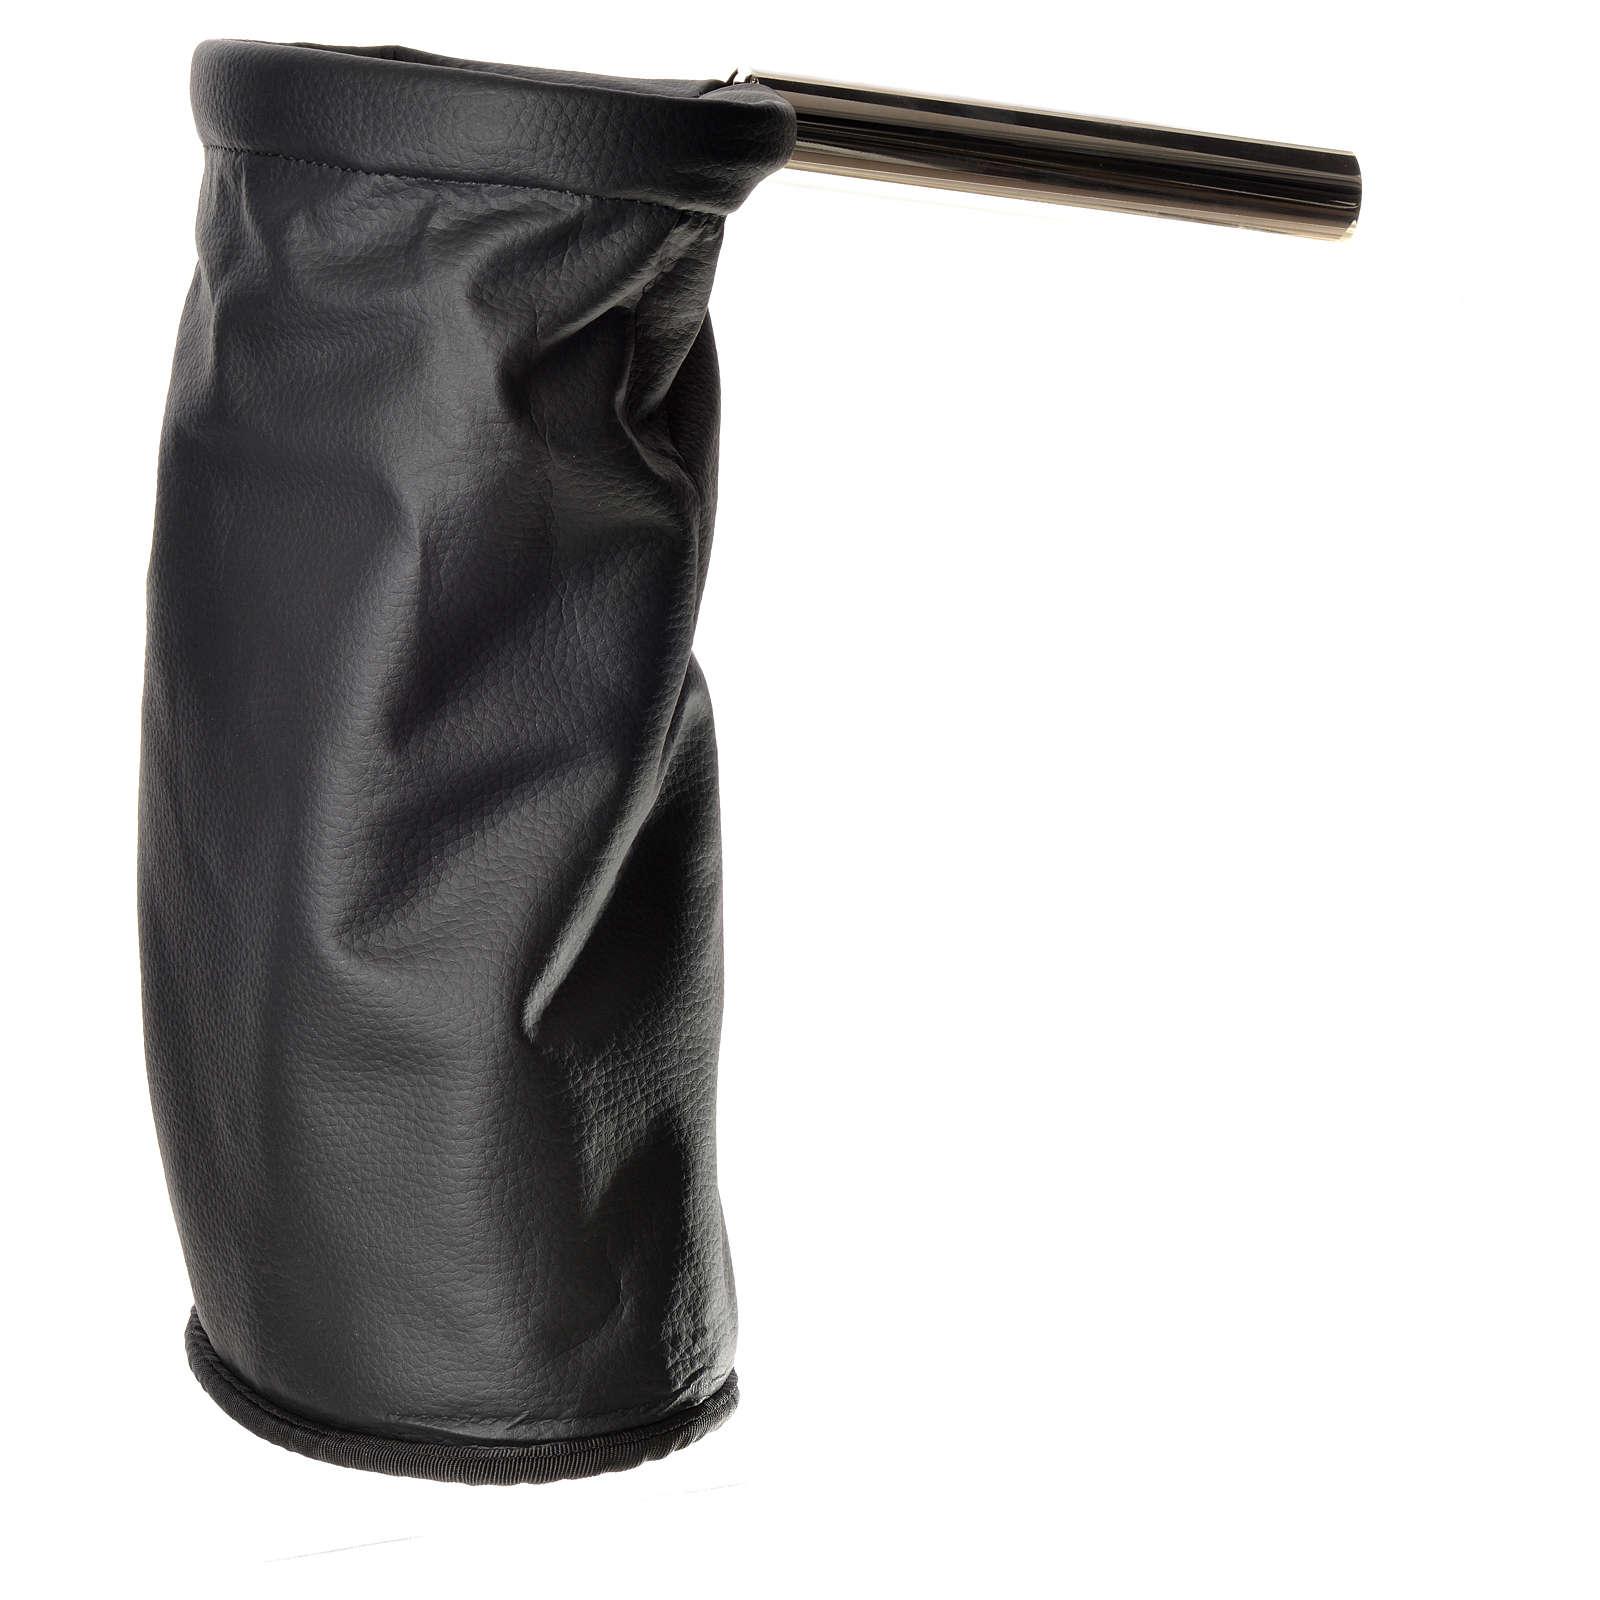 Bolsa para ofrendas (limosna) dorado y negro reversible | venta ...